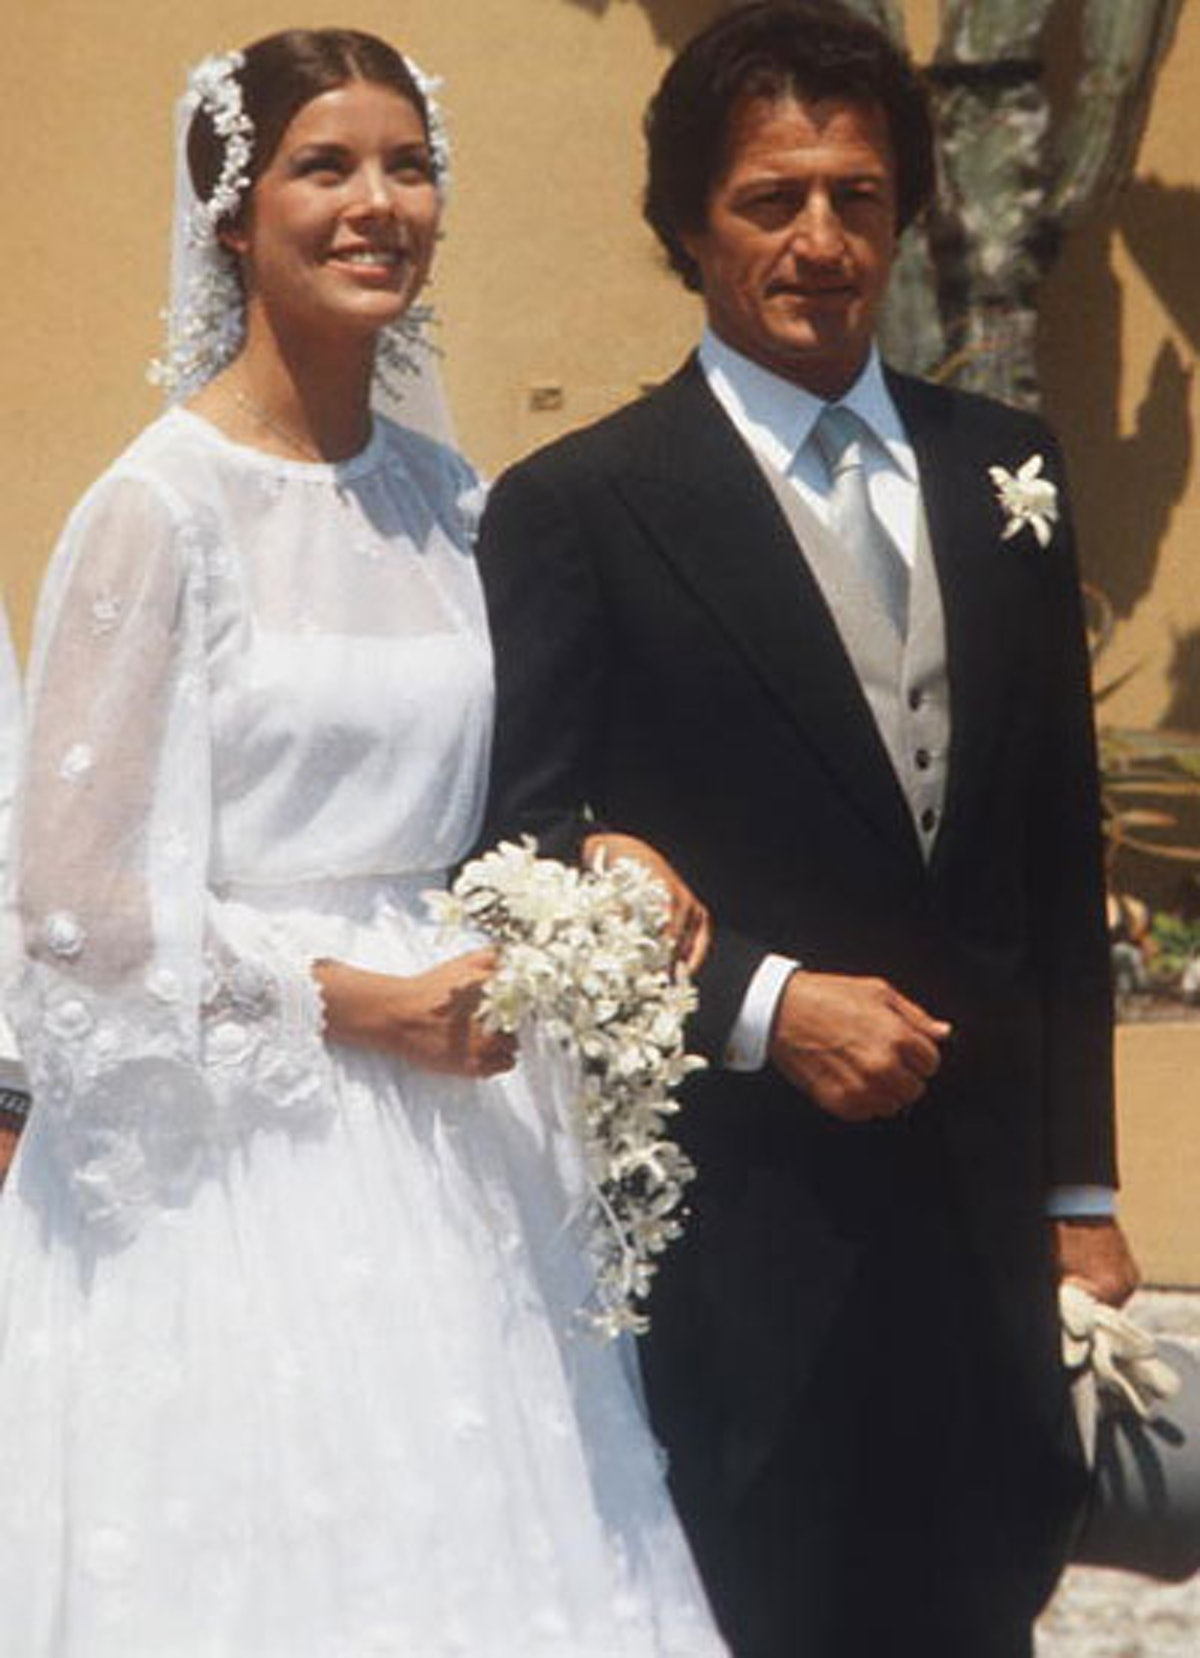 soss-royal-wedding-fashion-11-v.jpg